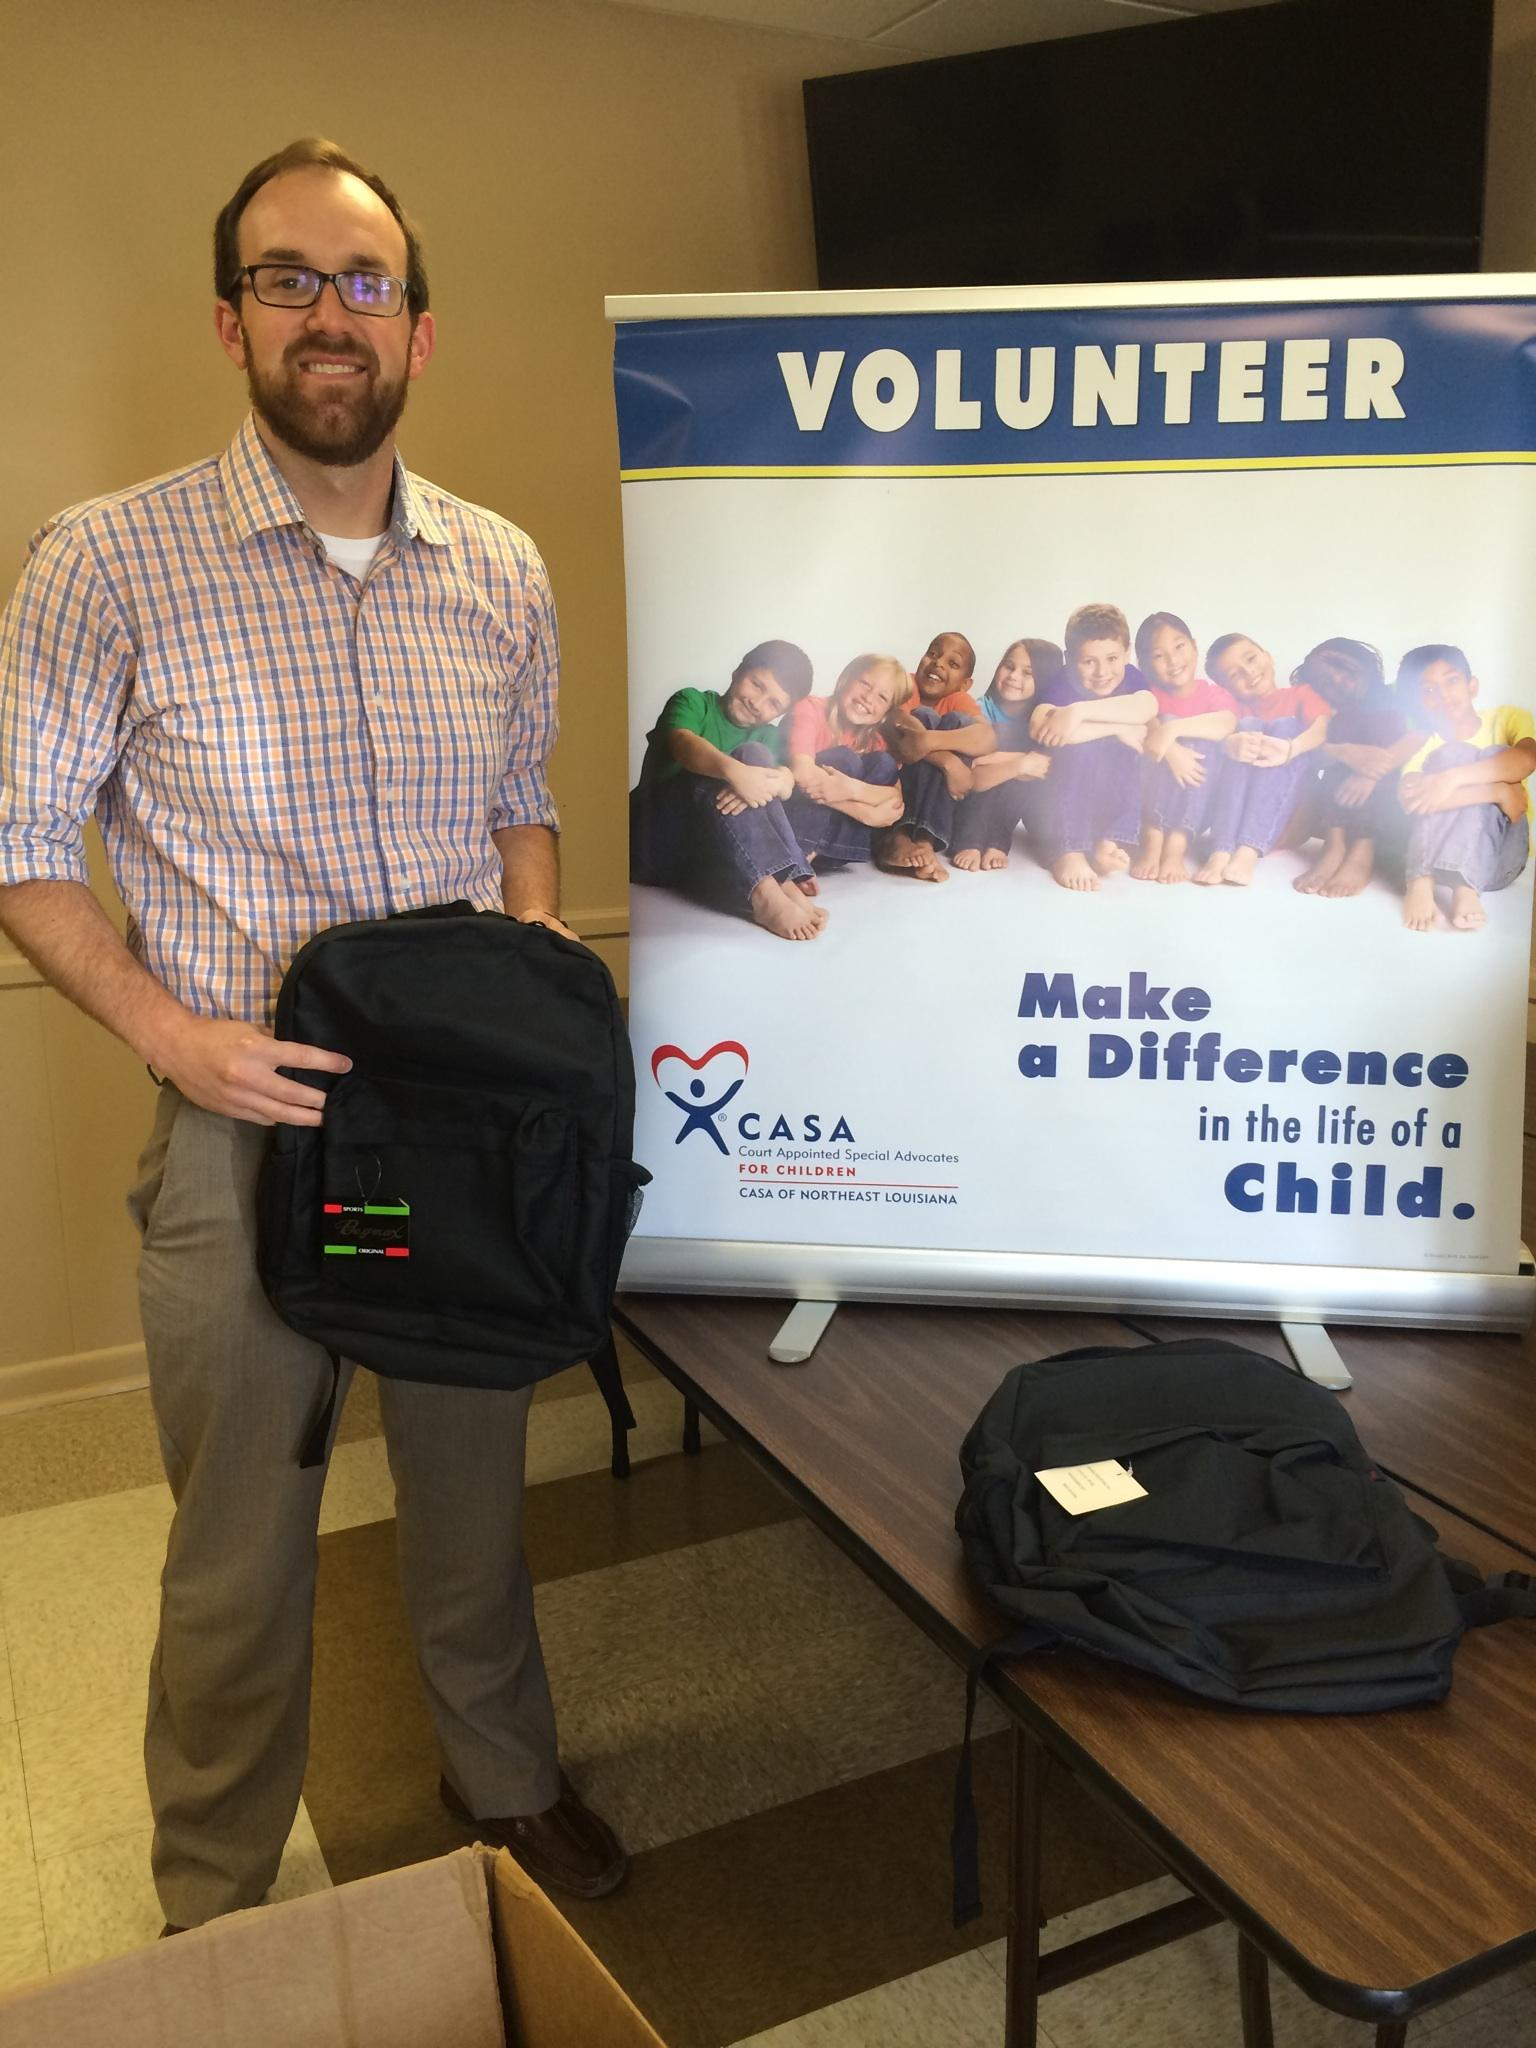 Adam McDonald - Community Development Coordinator